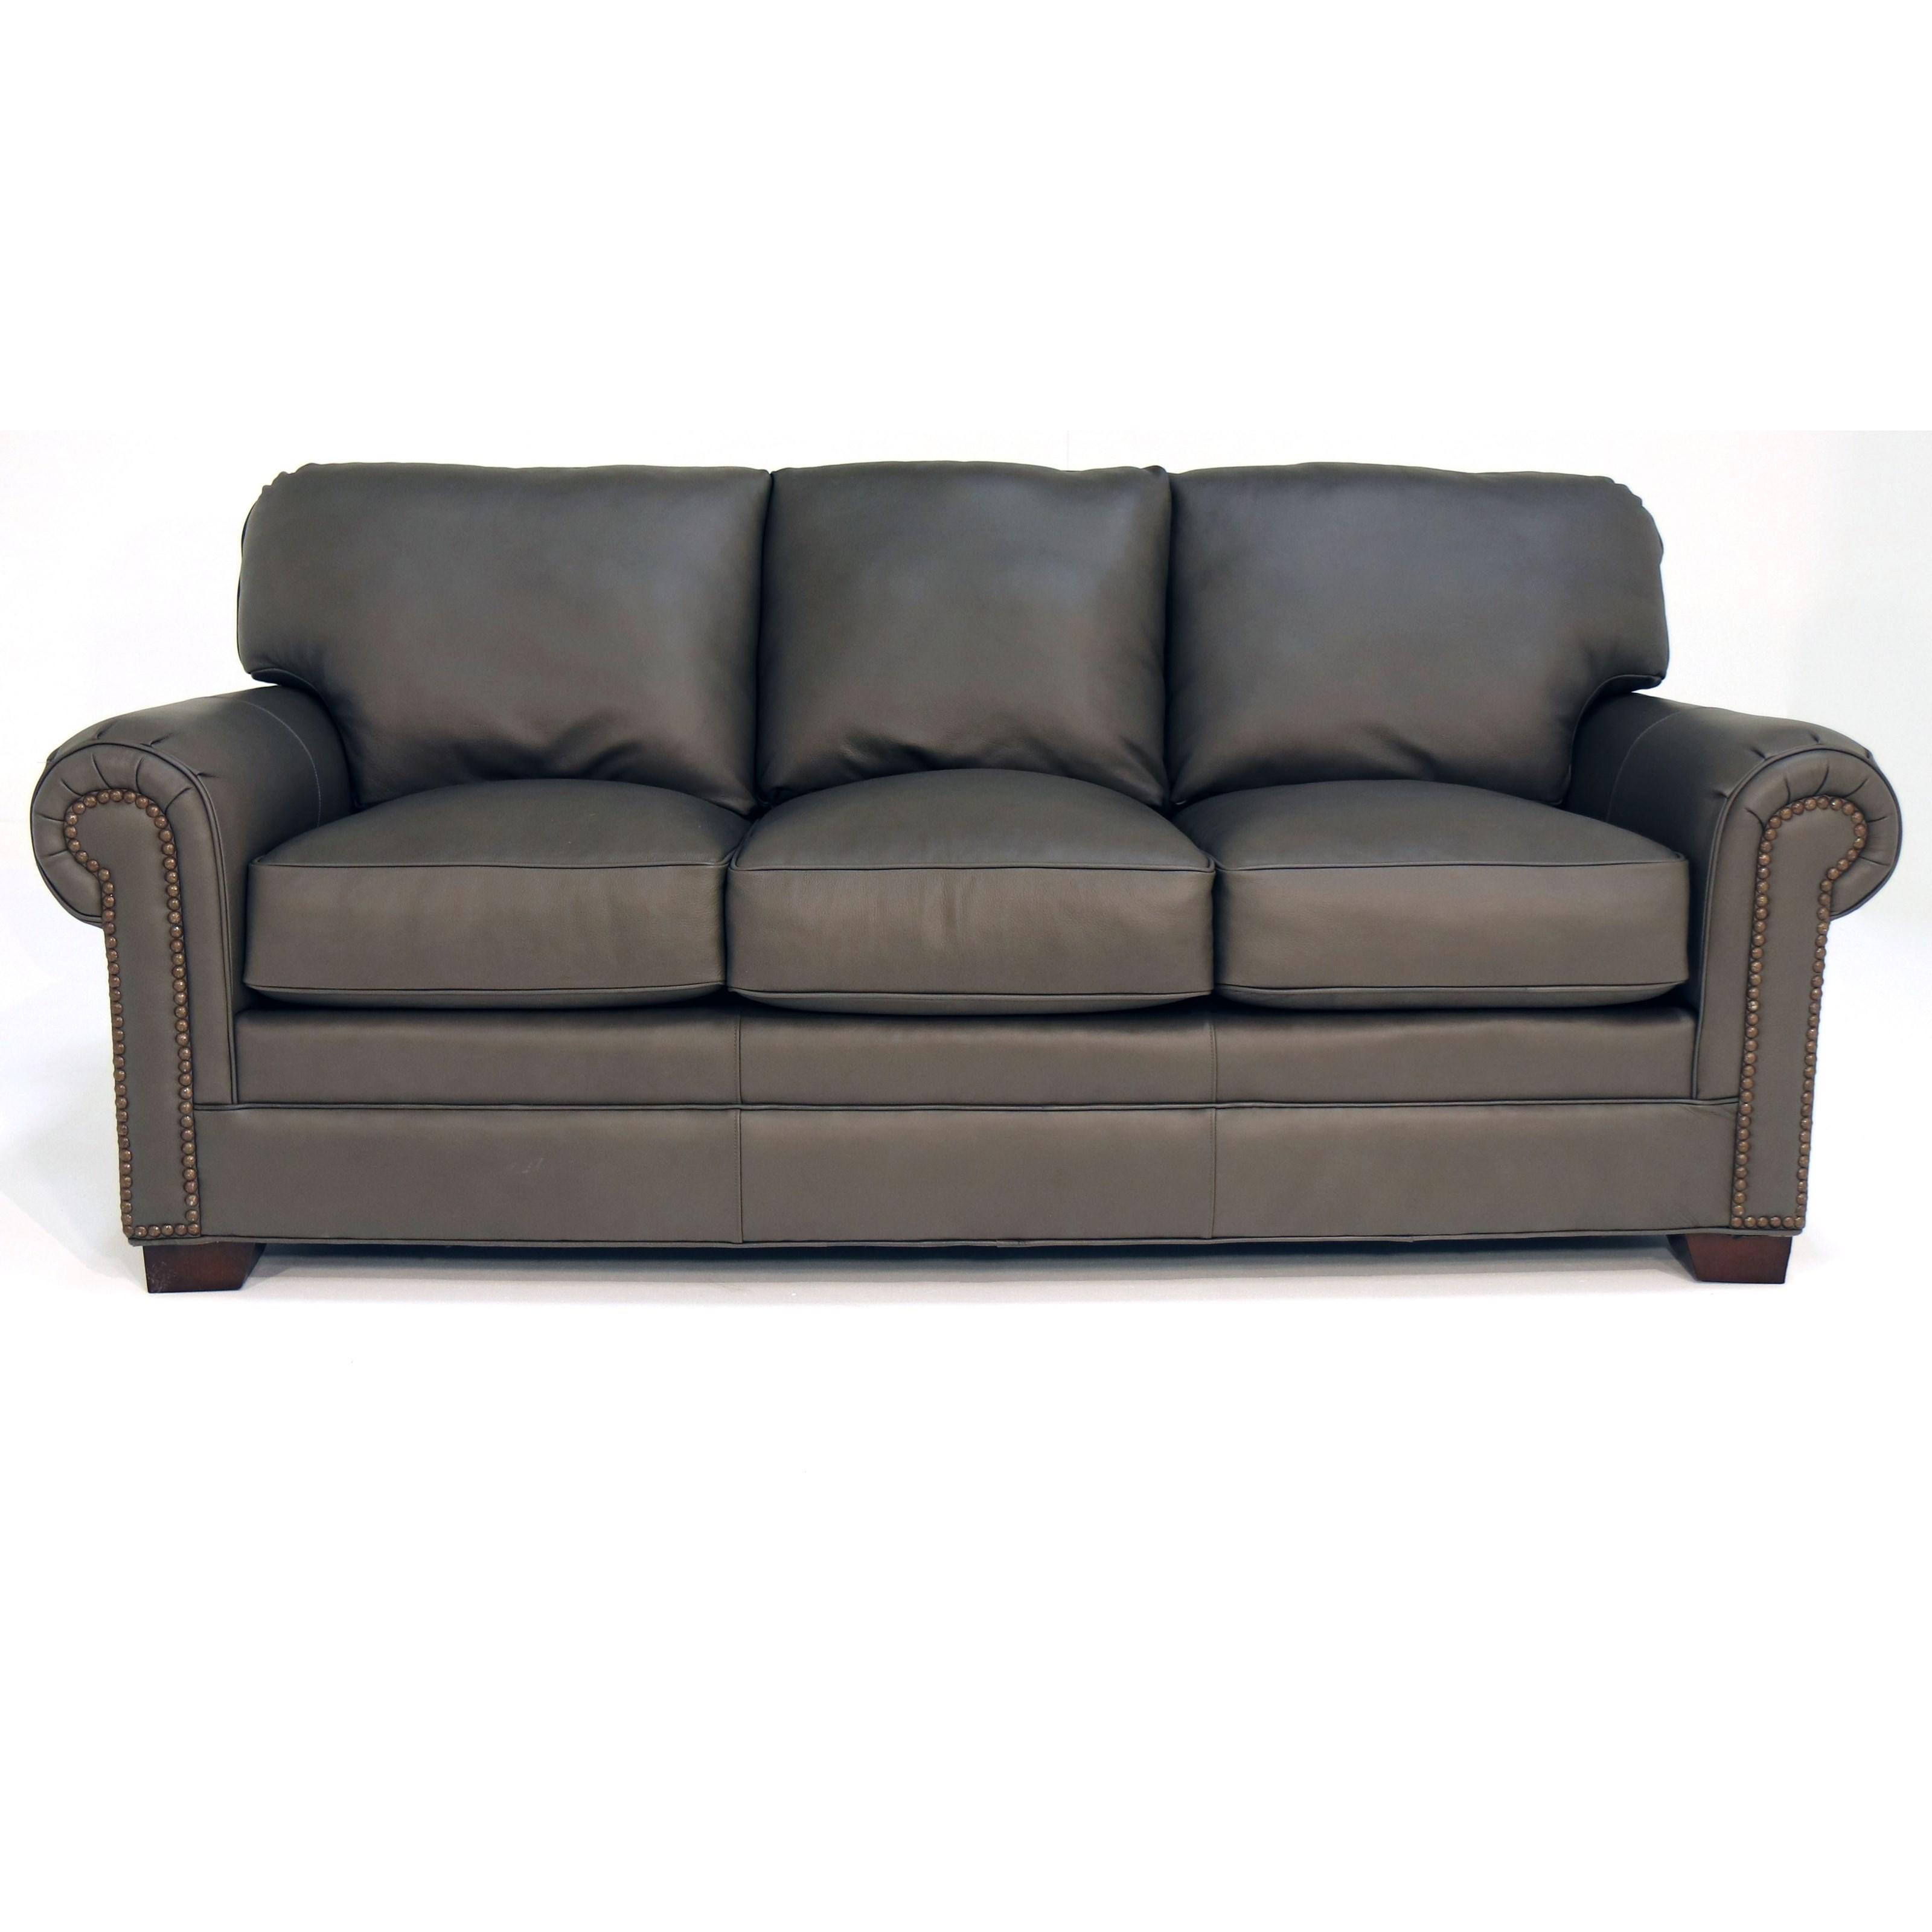 L756550 Sofa w/ Nailheads by Craftmaster at Baer's Furniture